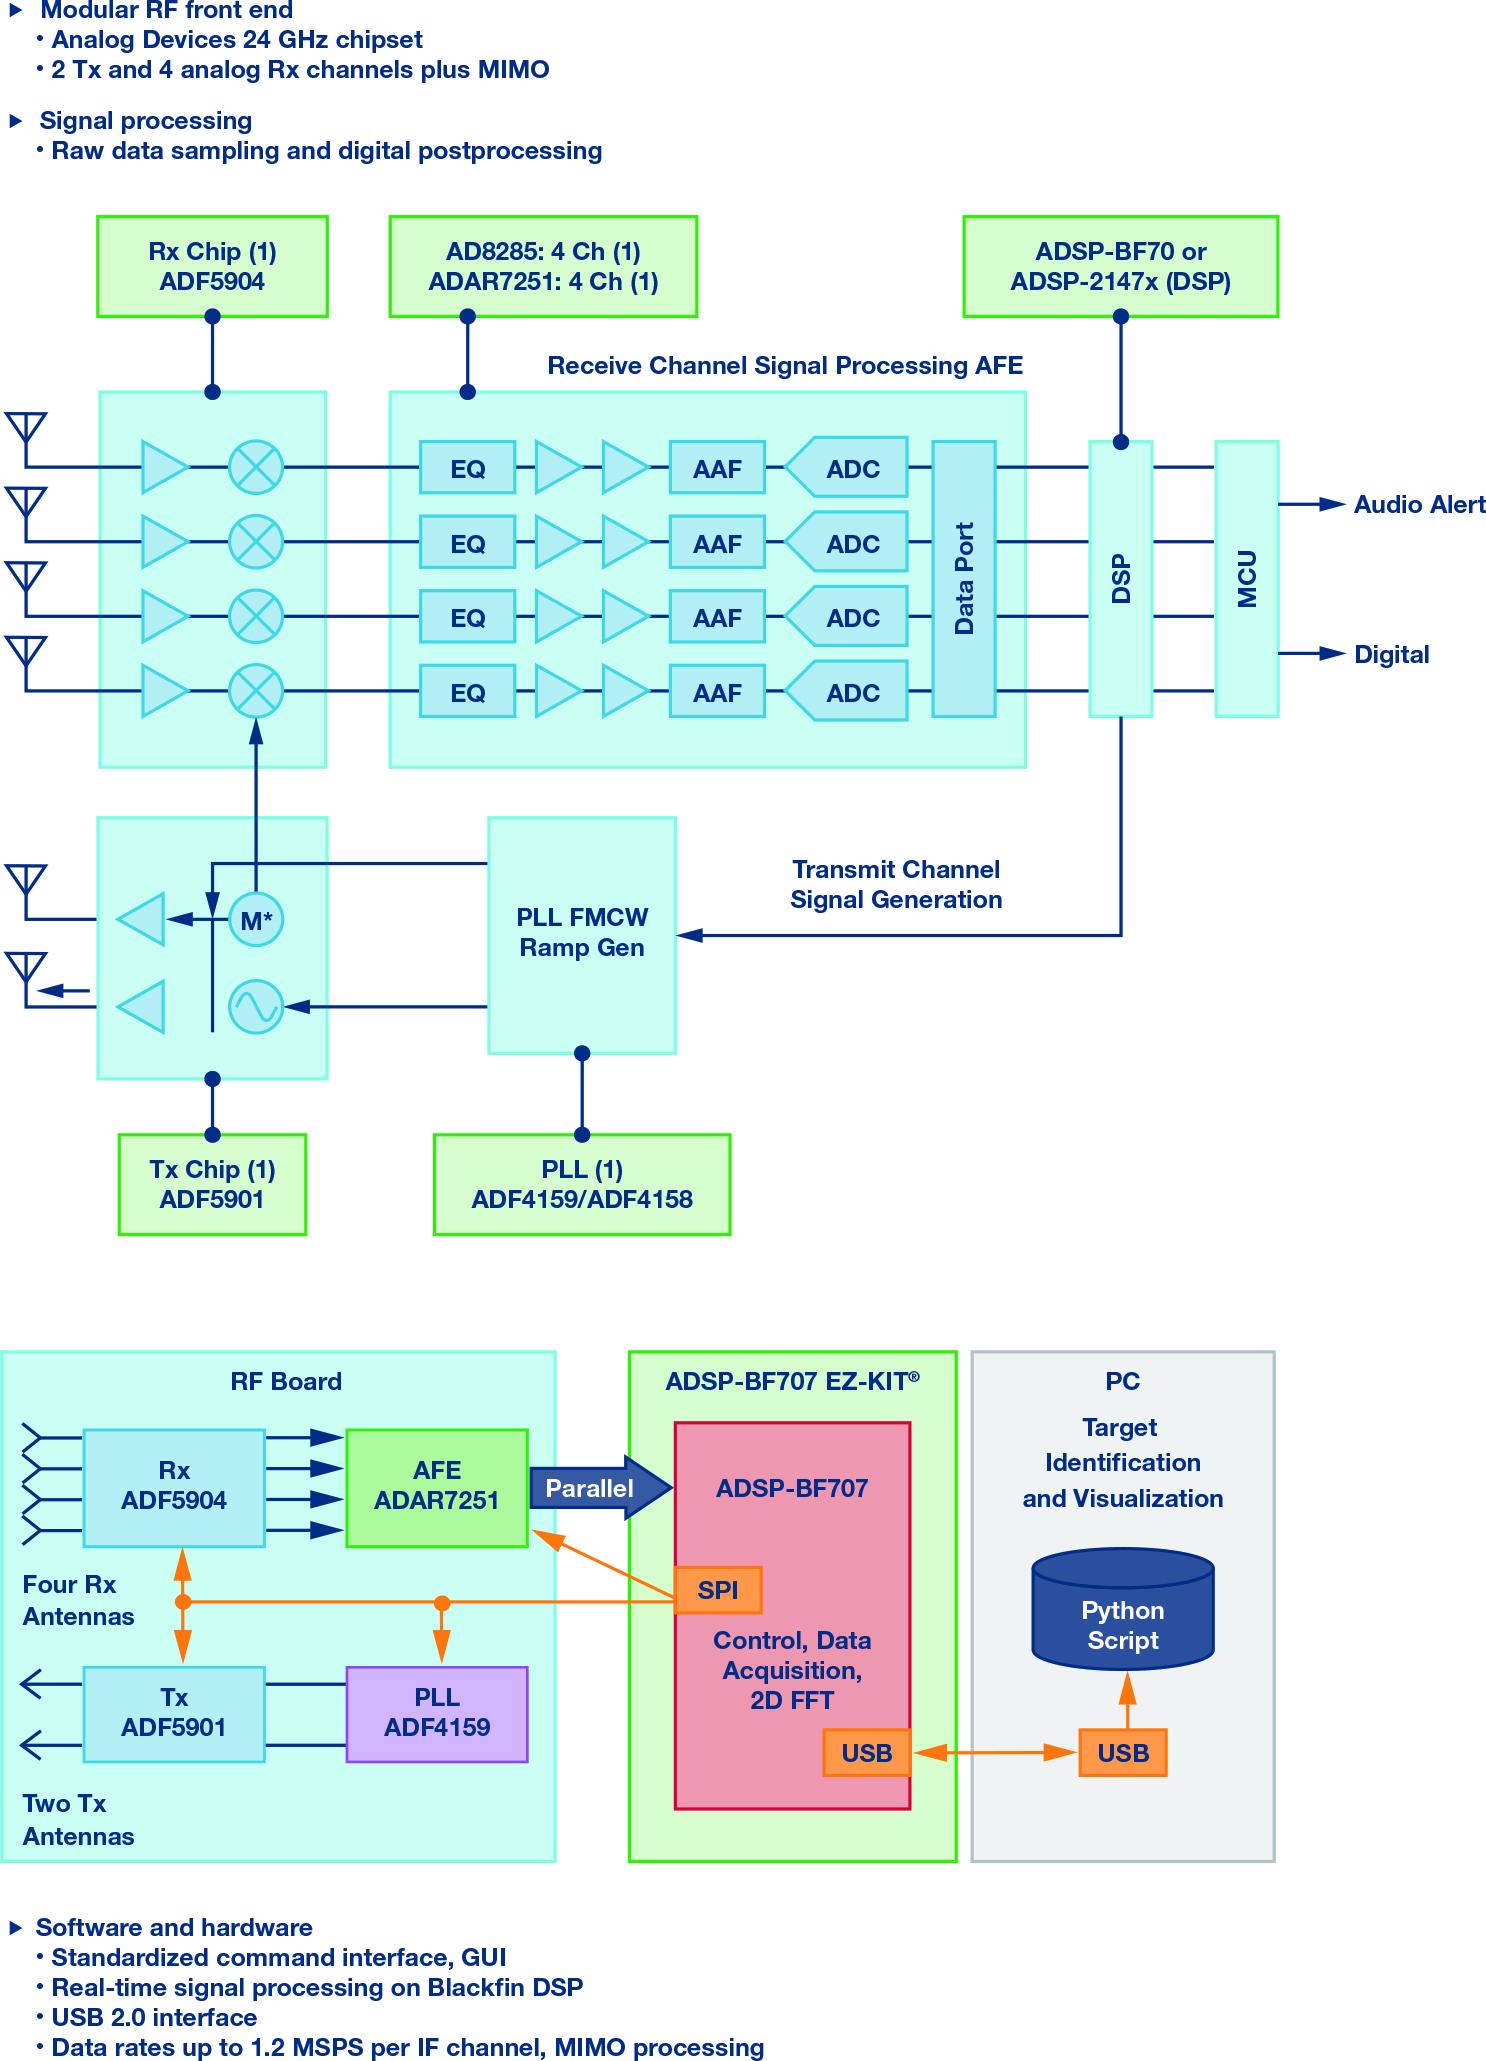 fmcw radar block diagram c3 corvette wiring power systems design psd information to your designs